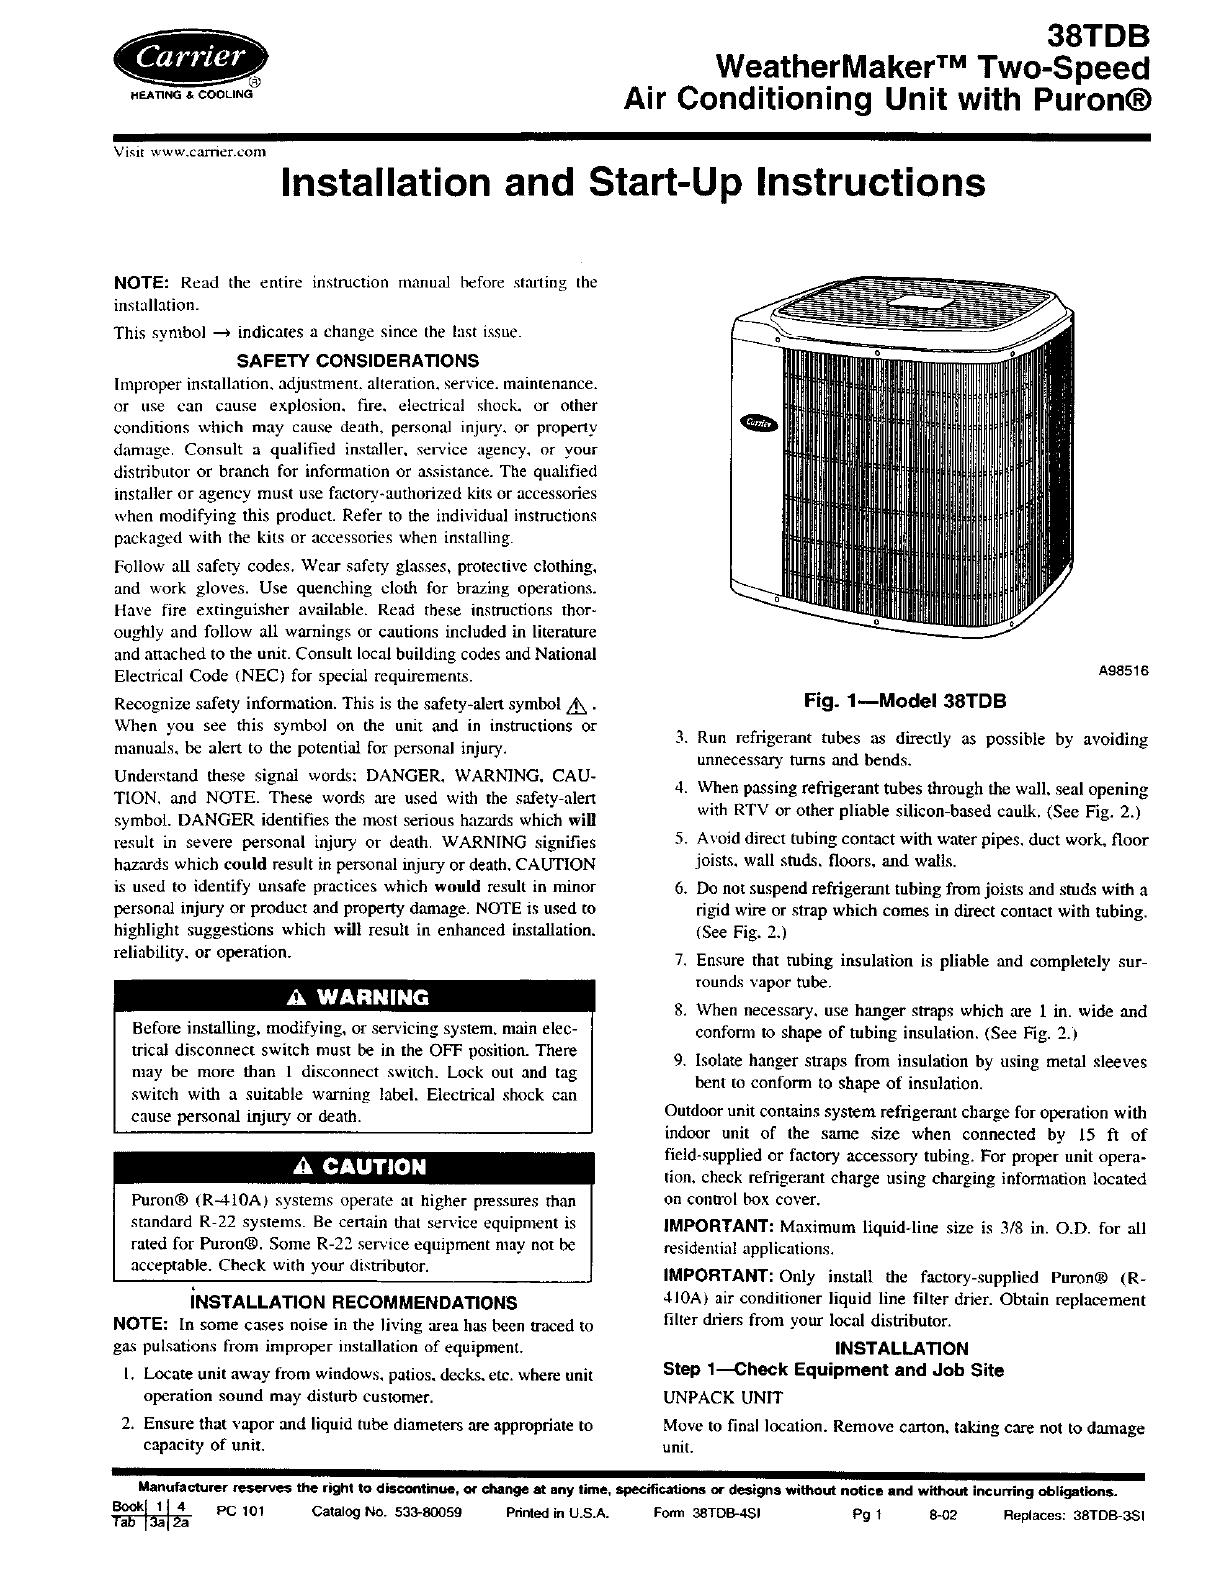 Mini Split Systems Manual Guide